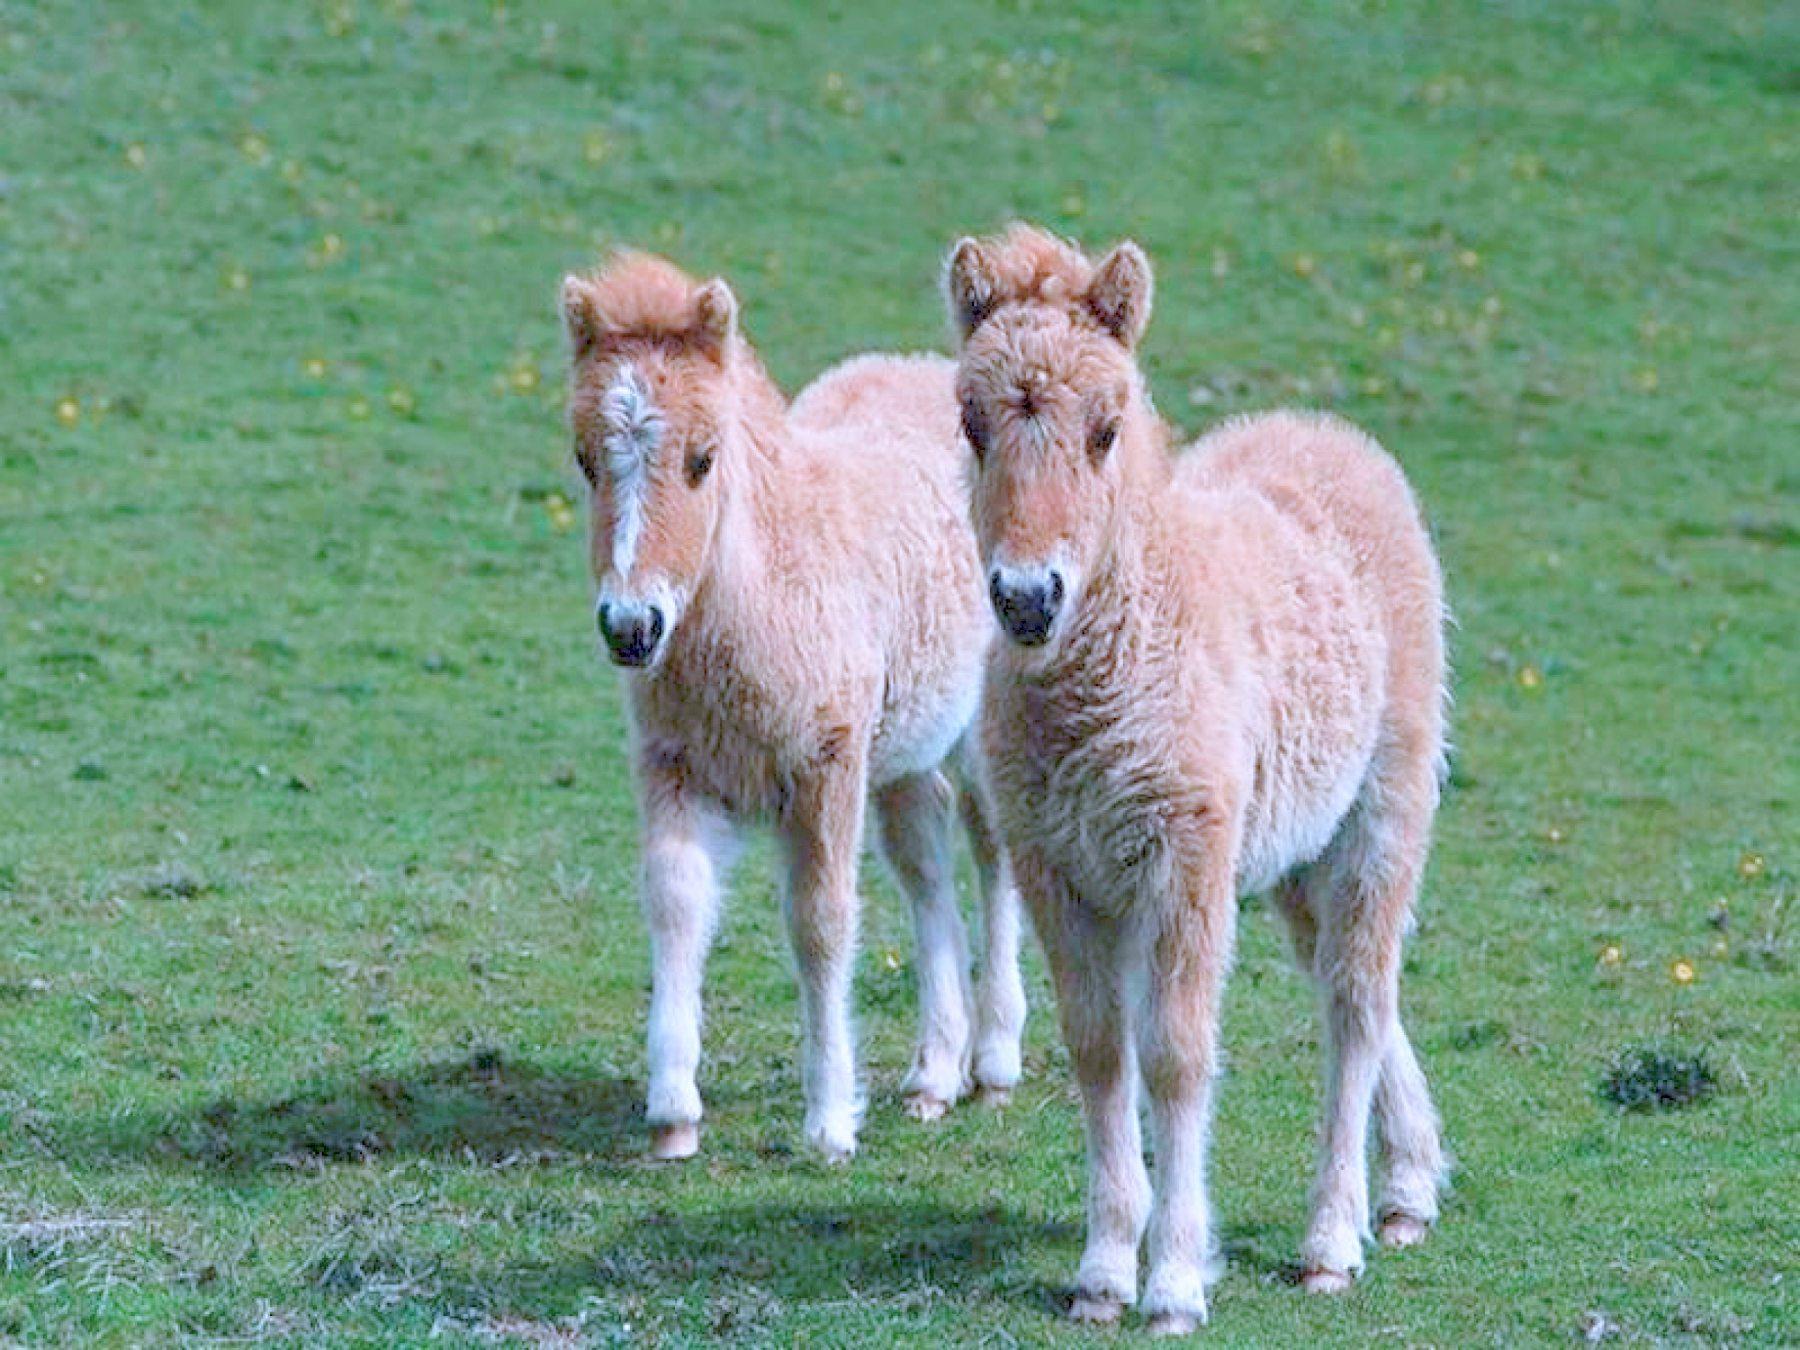 Donkey wallpapers HD